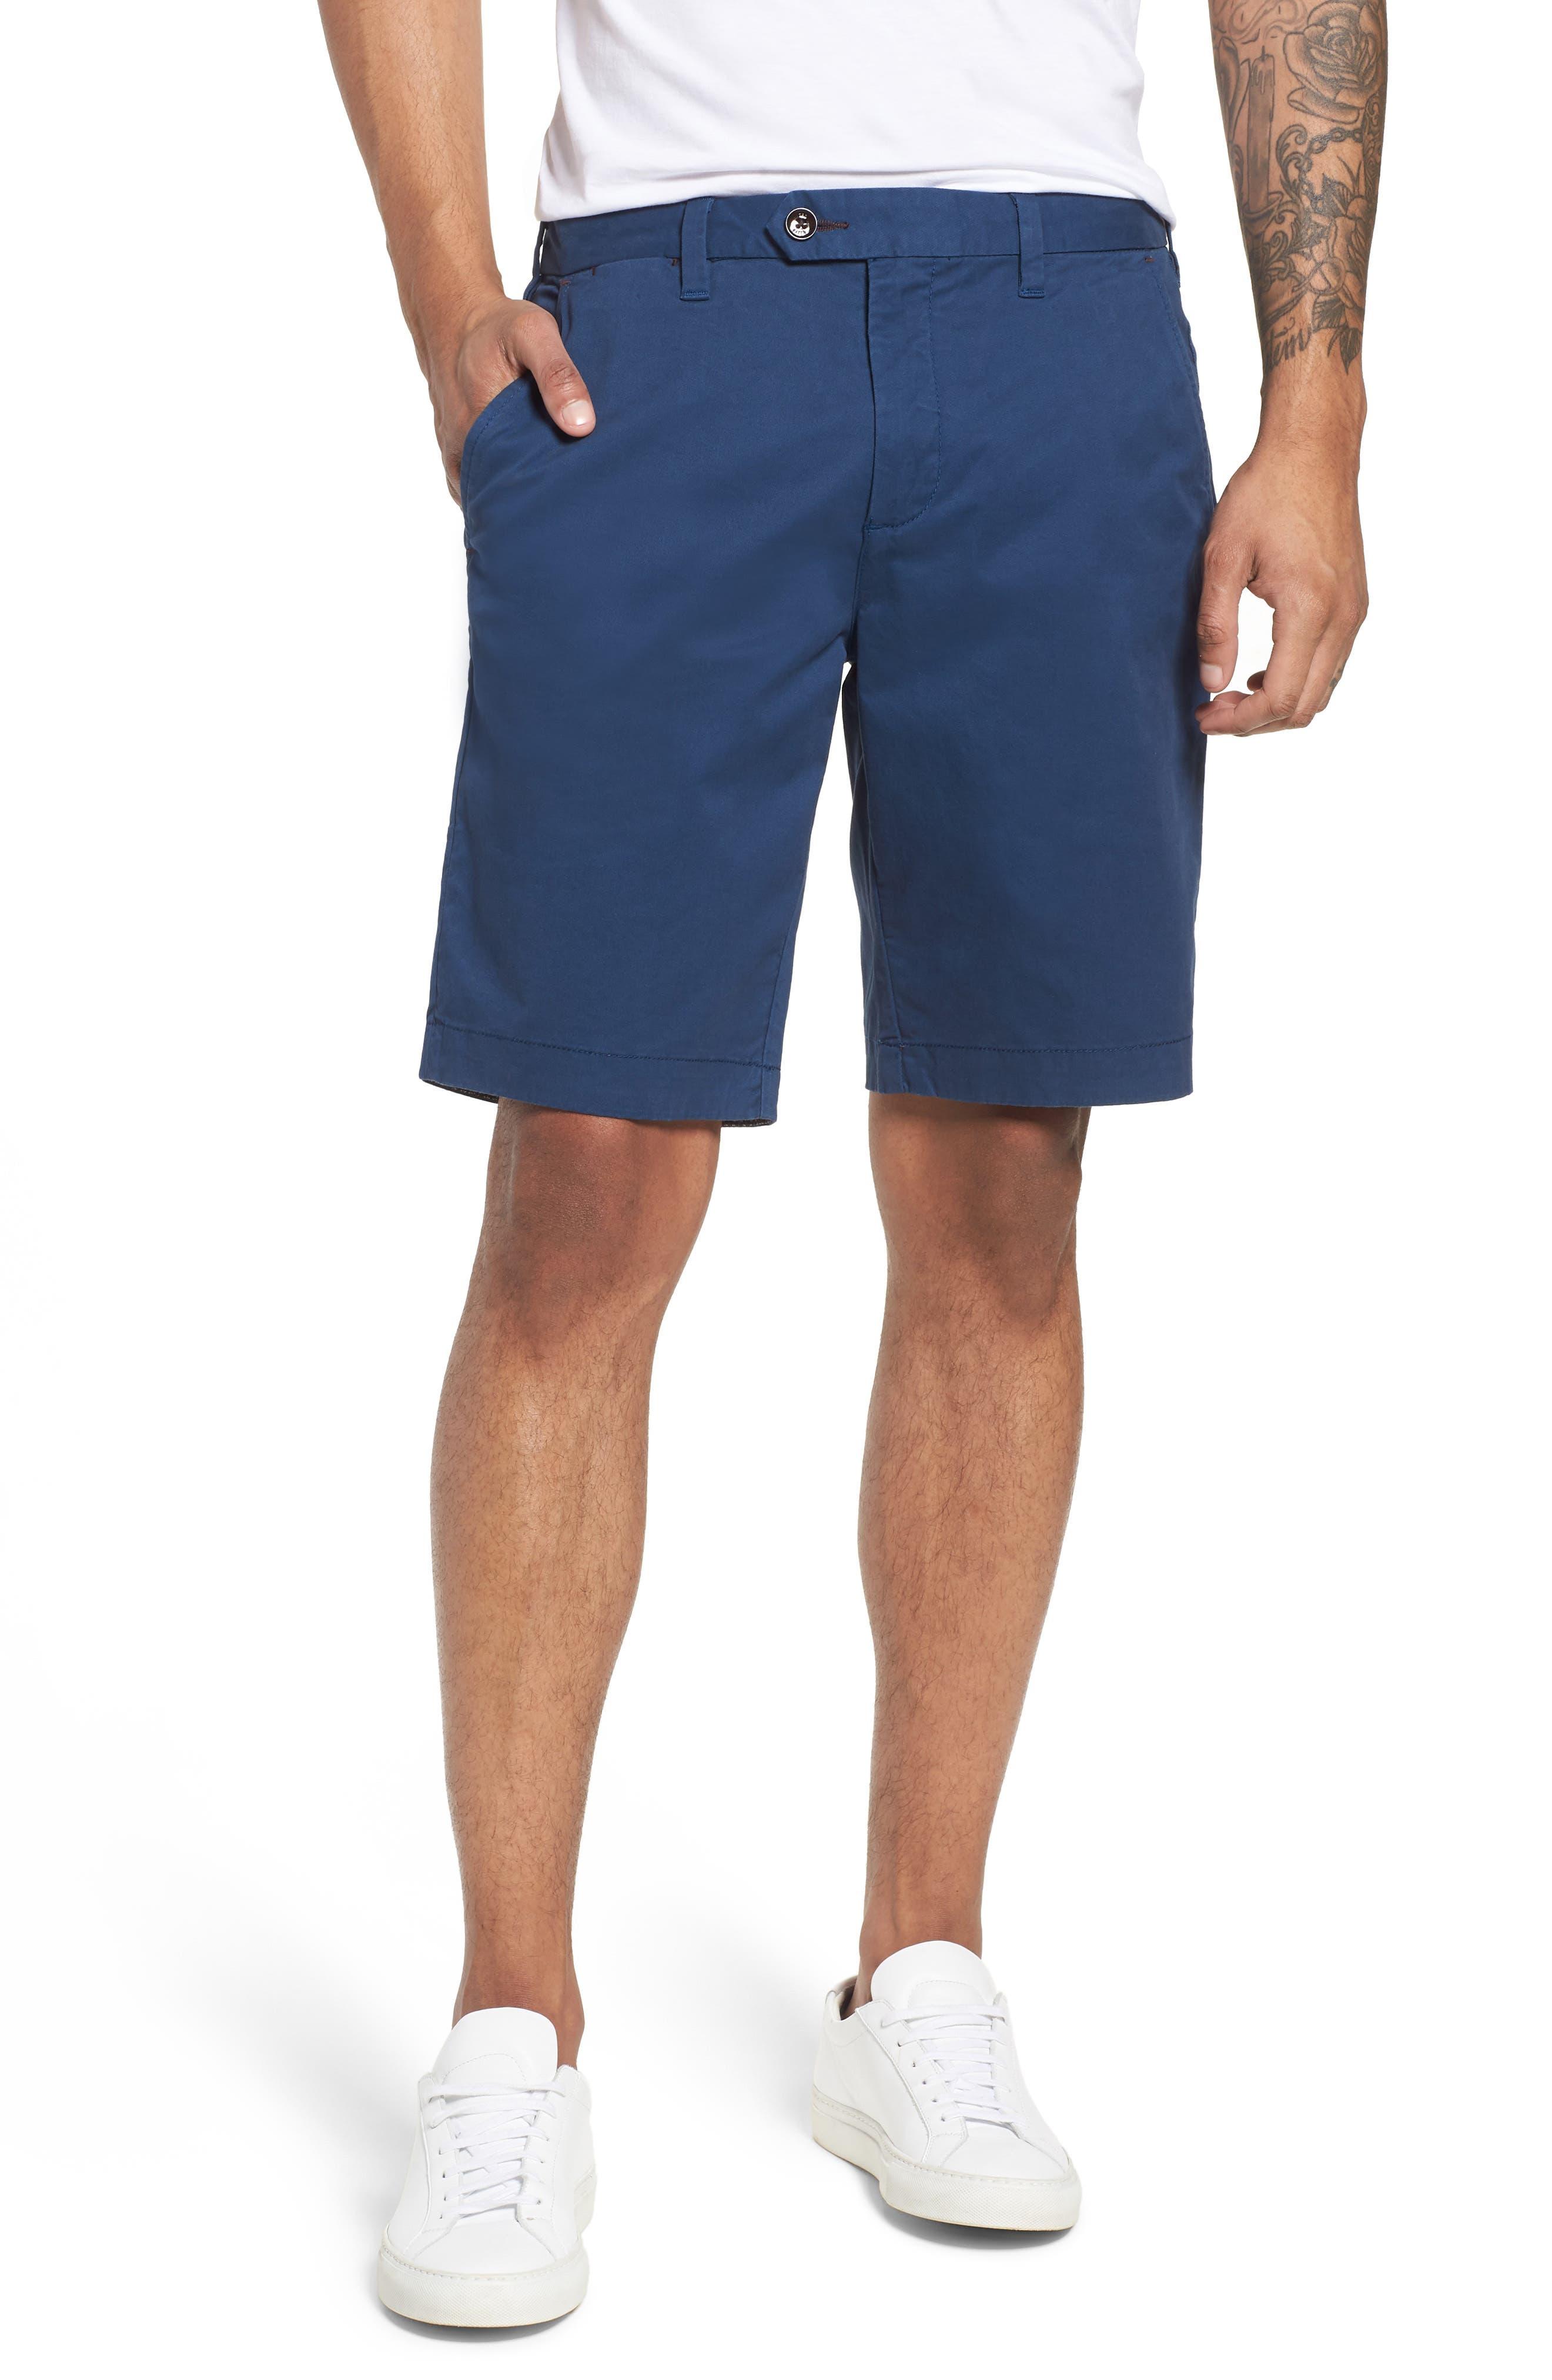 Proshor Slim Fit Chino Shorts,                             Main thumbnail 1, color,                             Dark Blue